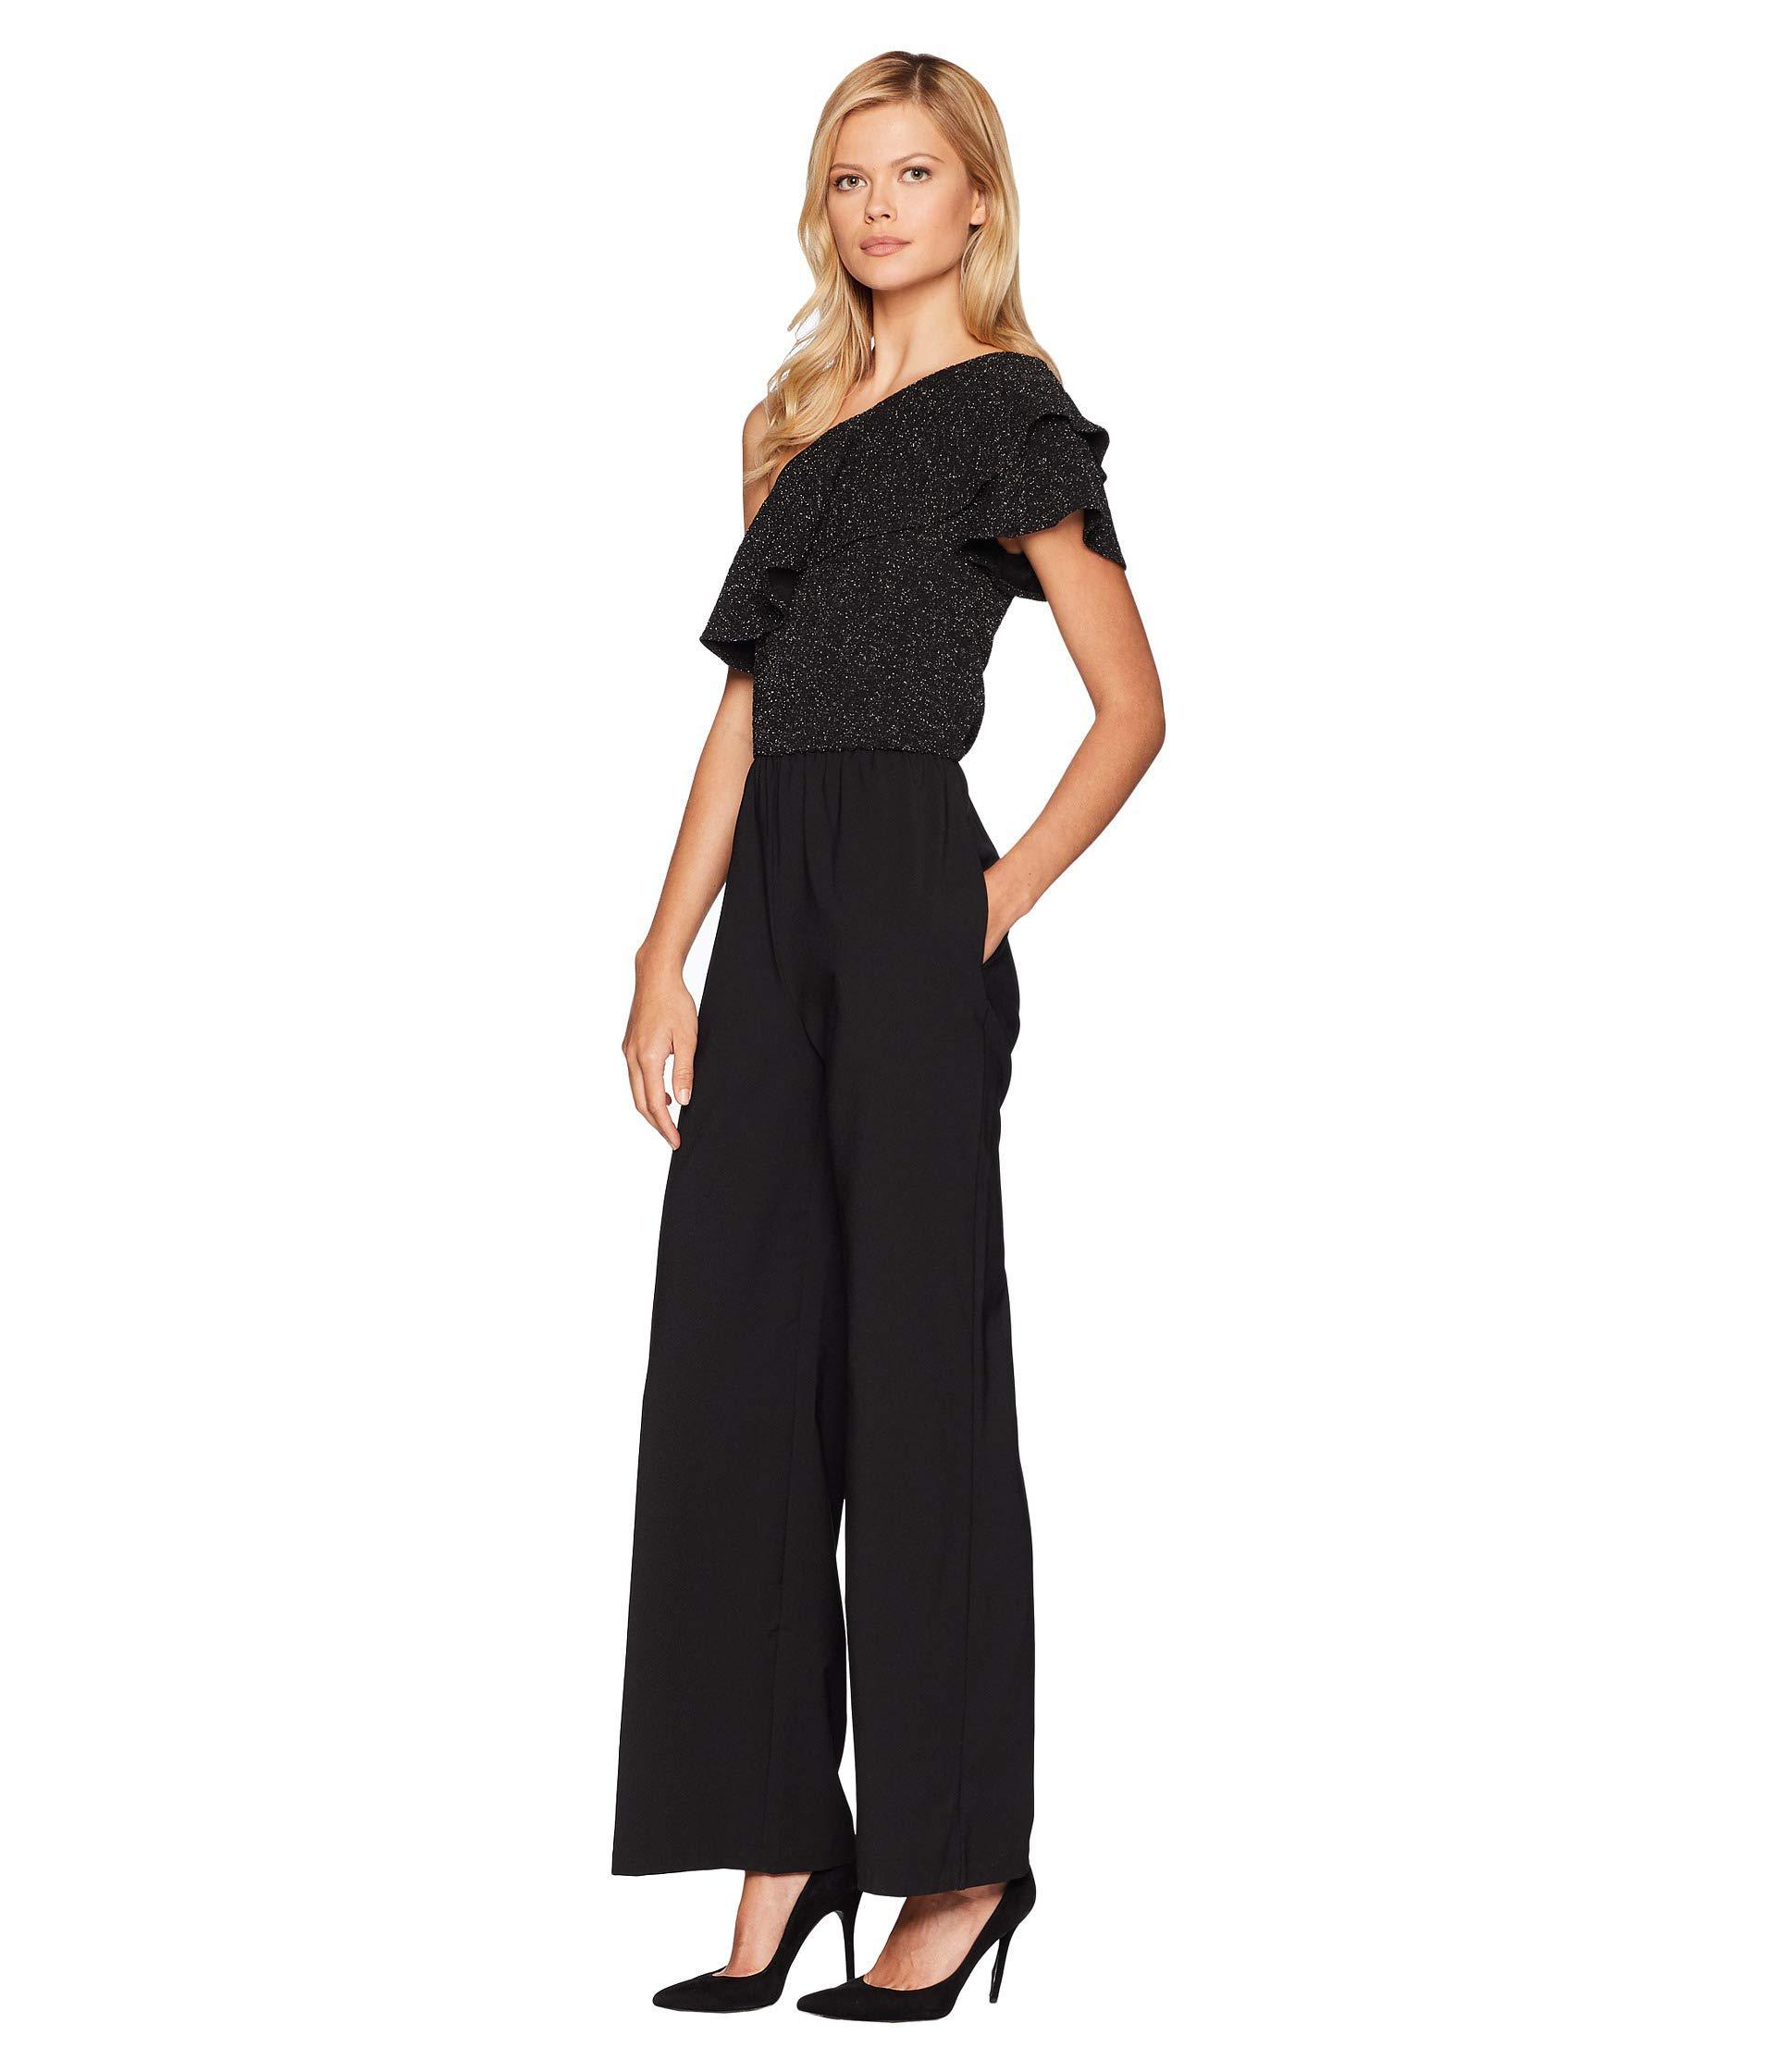 af8cfd8dec21 Lyst - Eci One Shoulder Metallic Bodice Knit Jumpsuit in Black